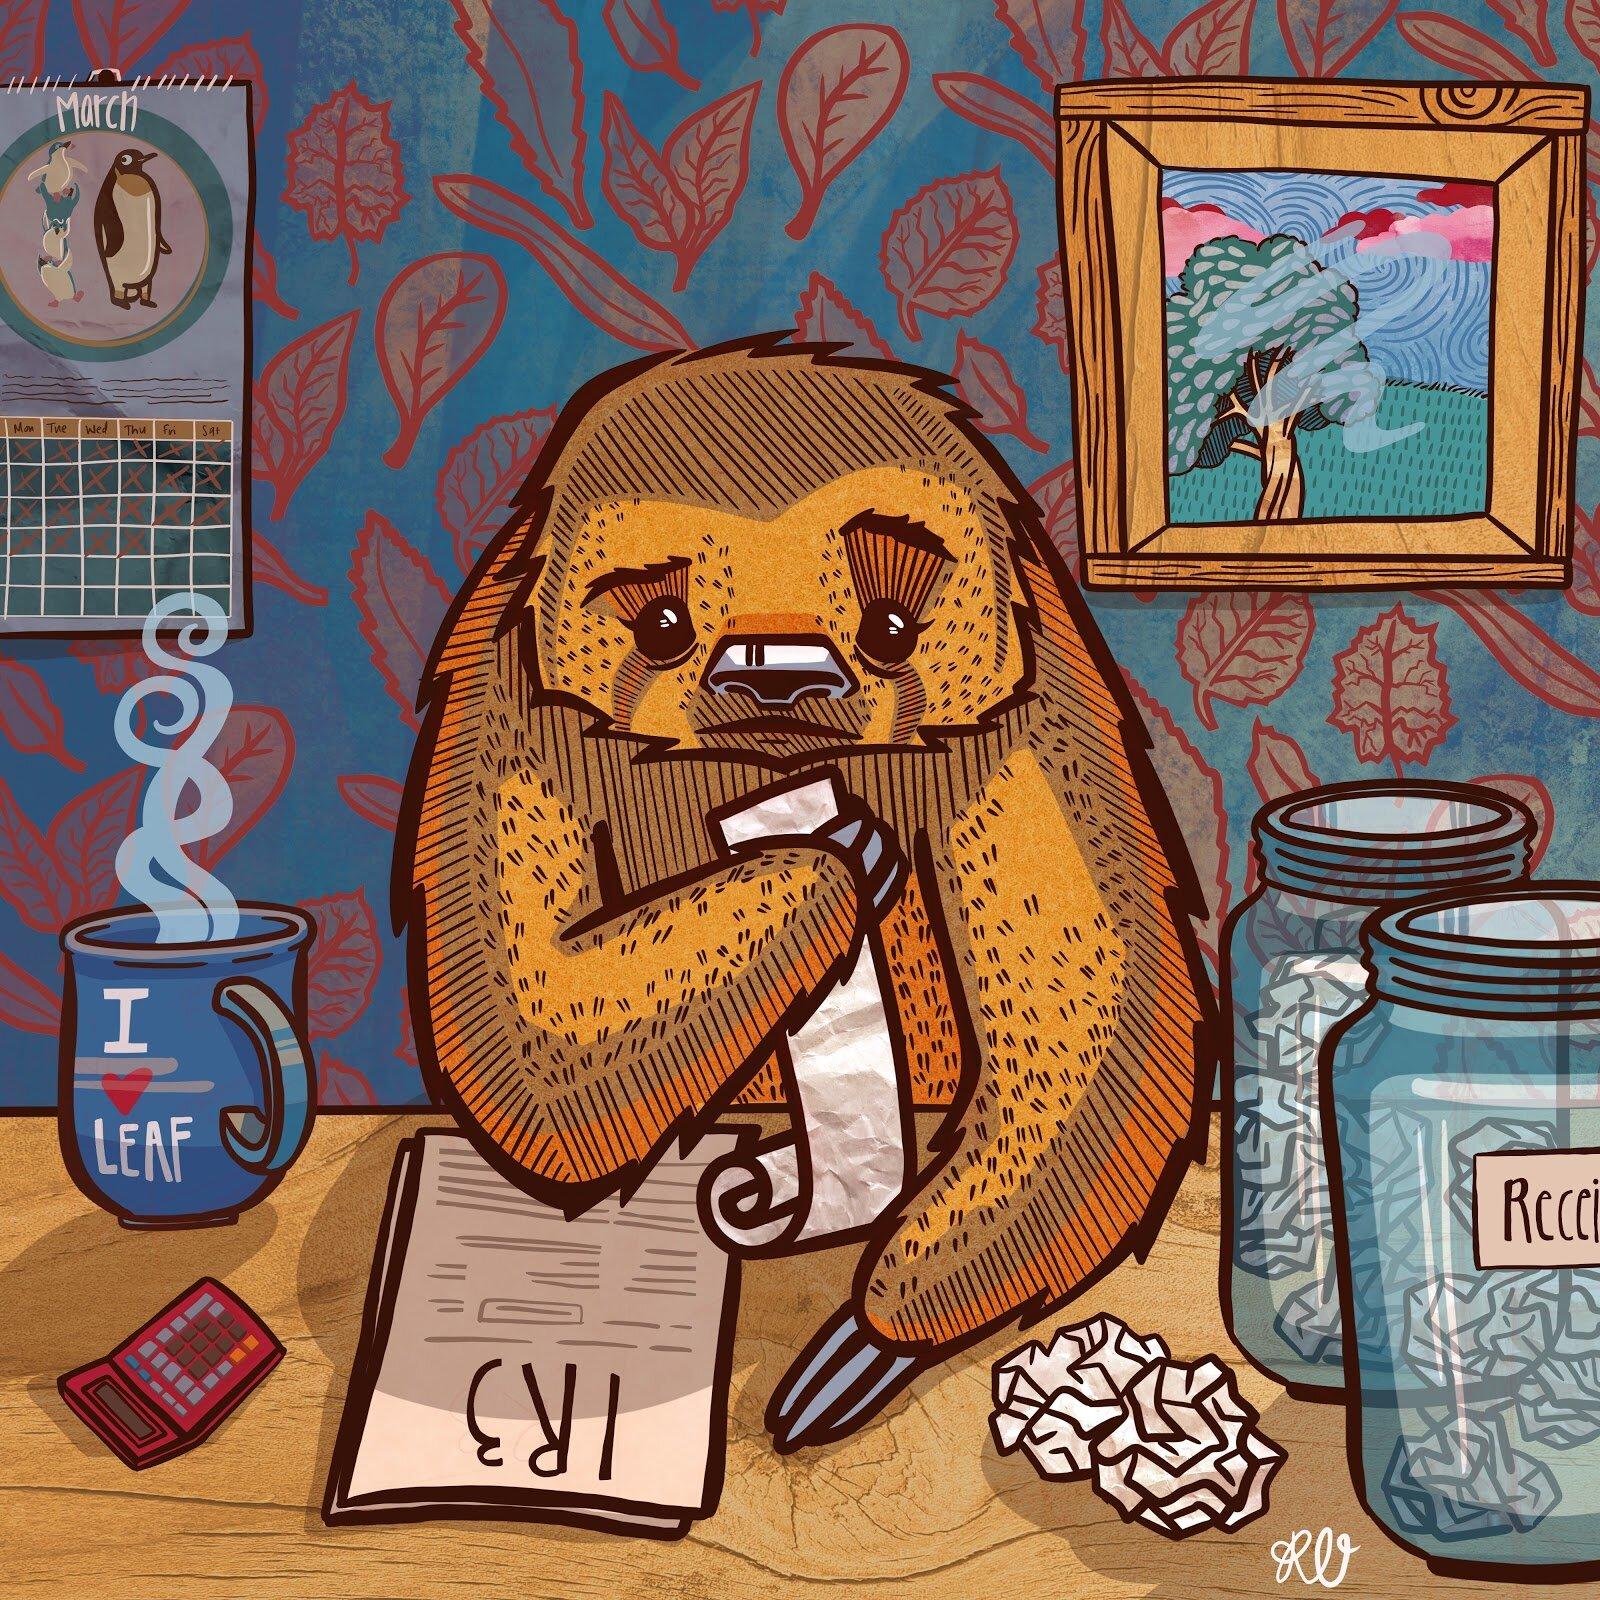 Digital illustration by Rose - a sloth filing an IR3 tax return form